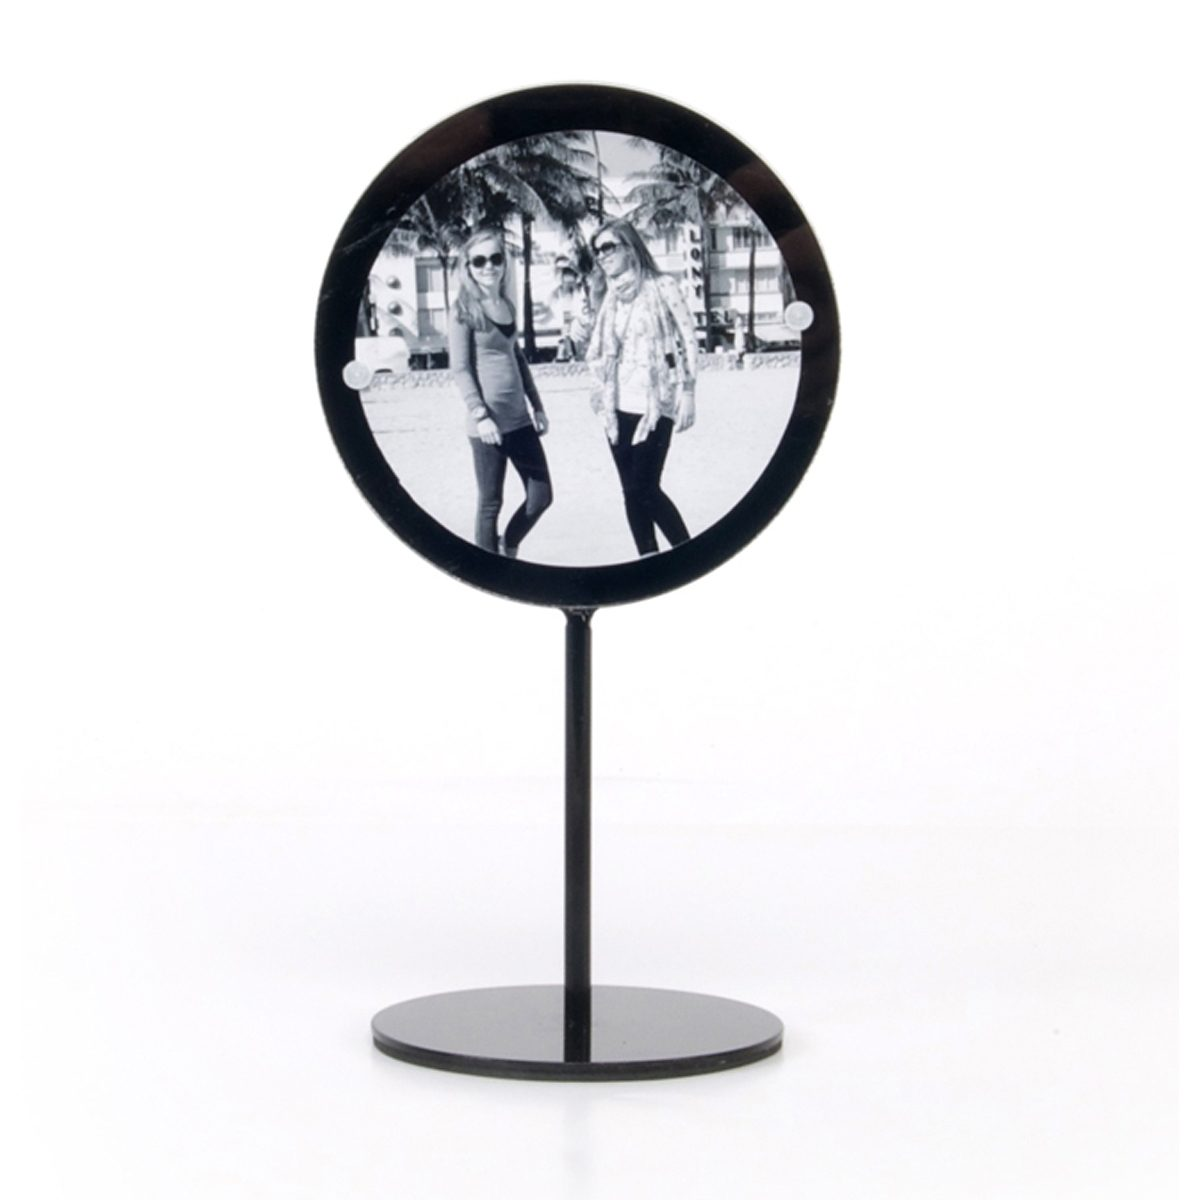 XLBoom XLBOOM Spiegel BLUSH medium, schwarz